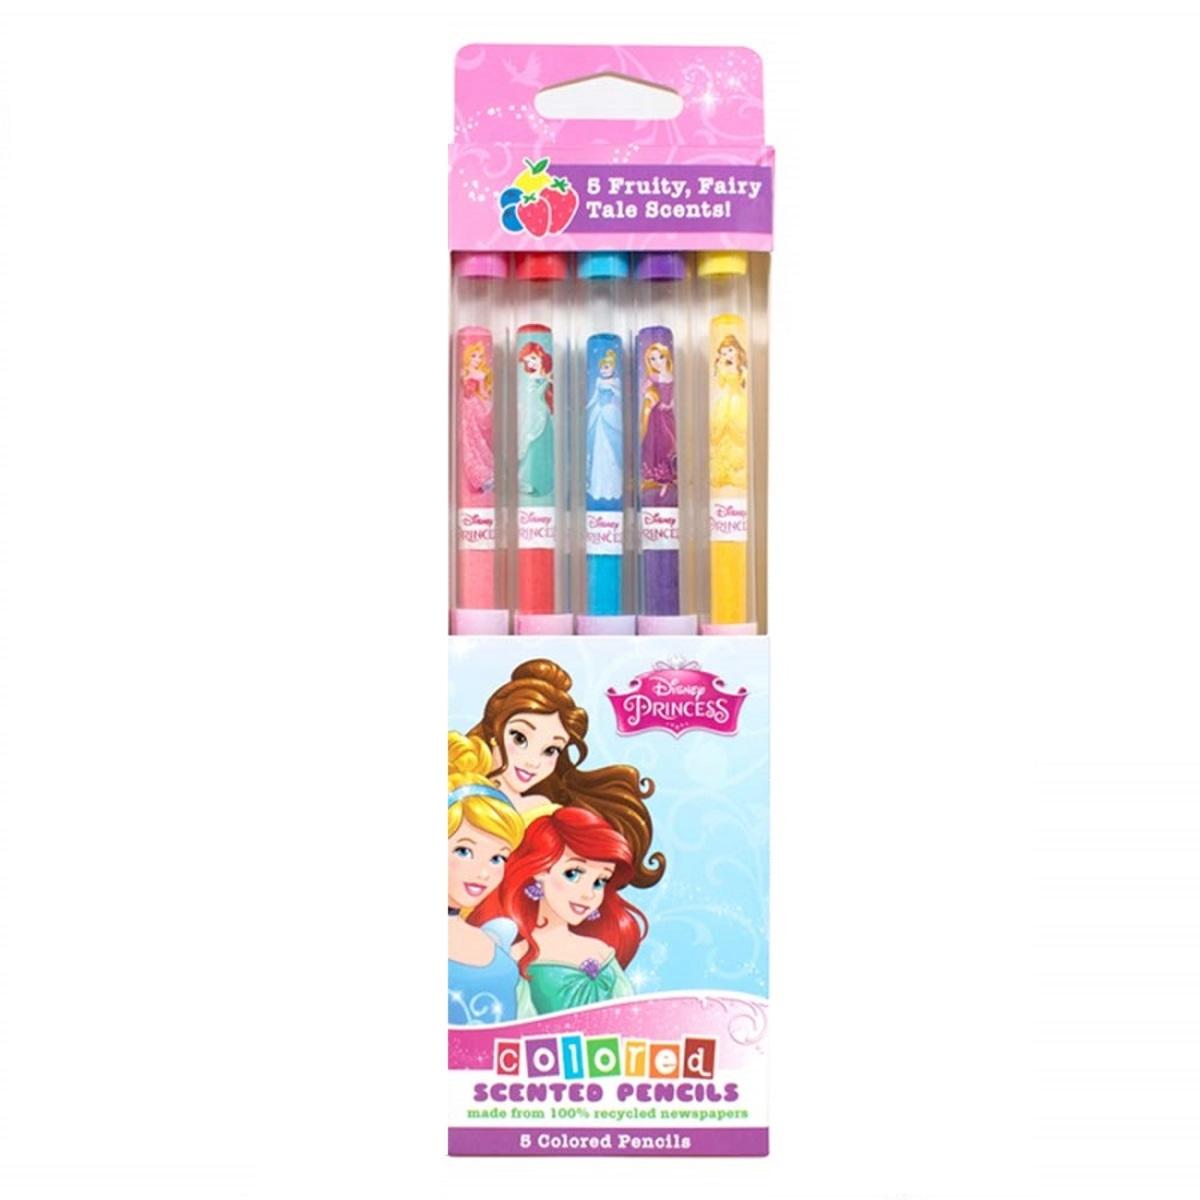 The Disney Princess Coloured Pencils 5-pack DP4007